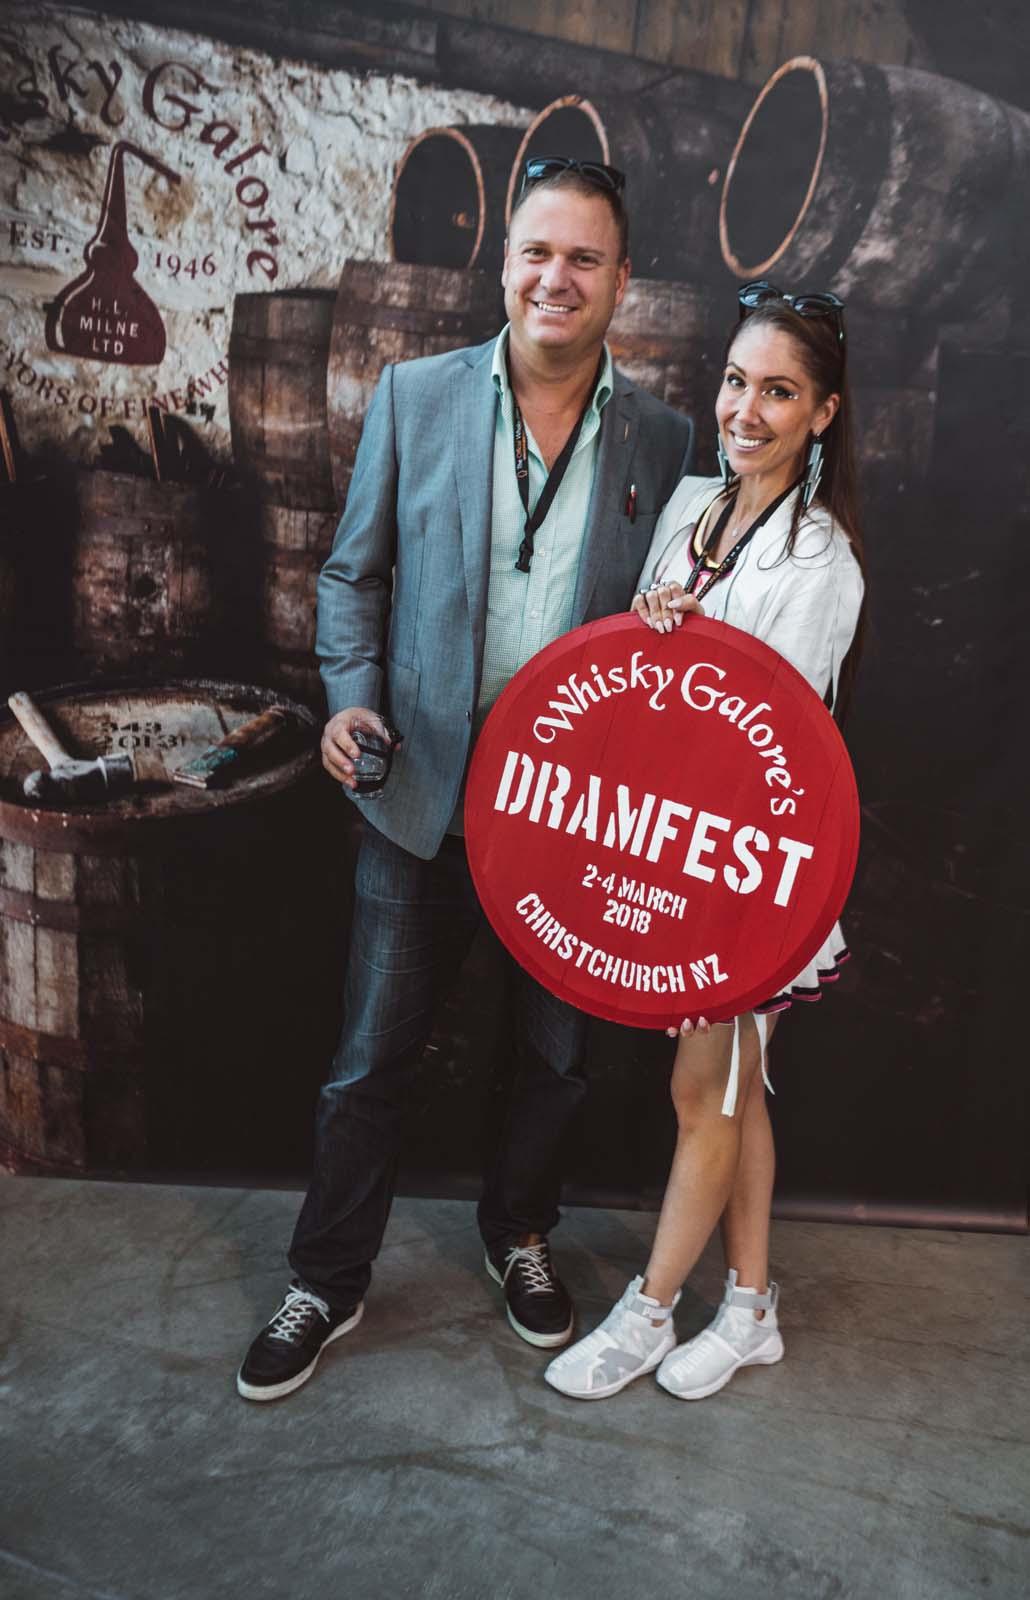 Dramfest 2018 for Whisky Galore-11.jpg